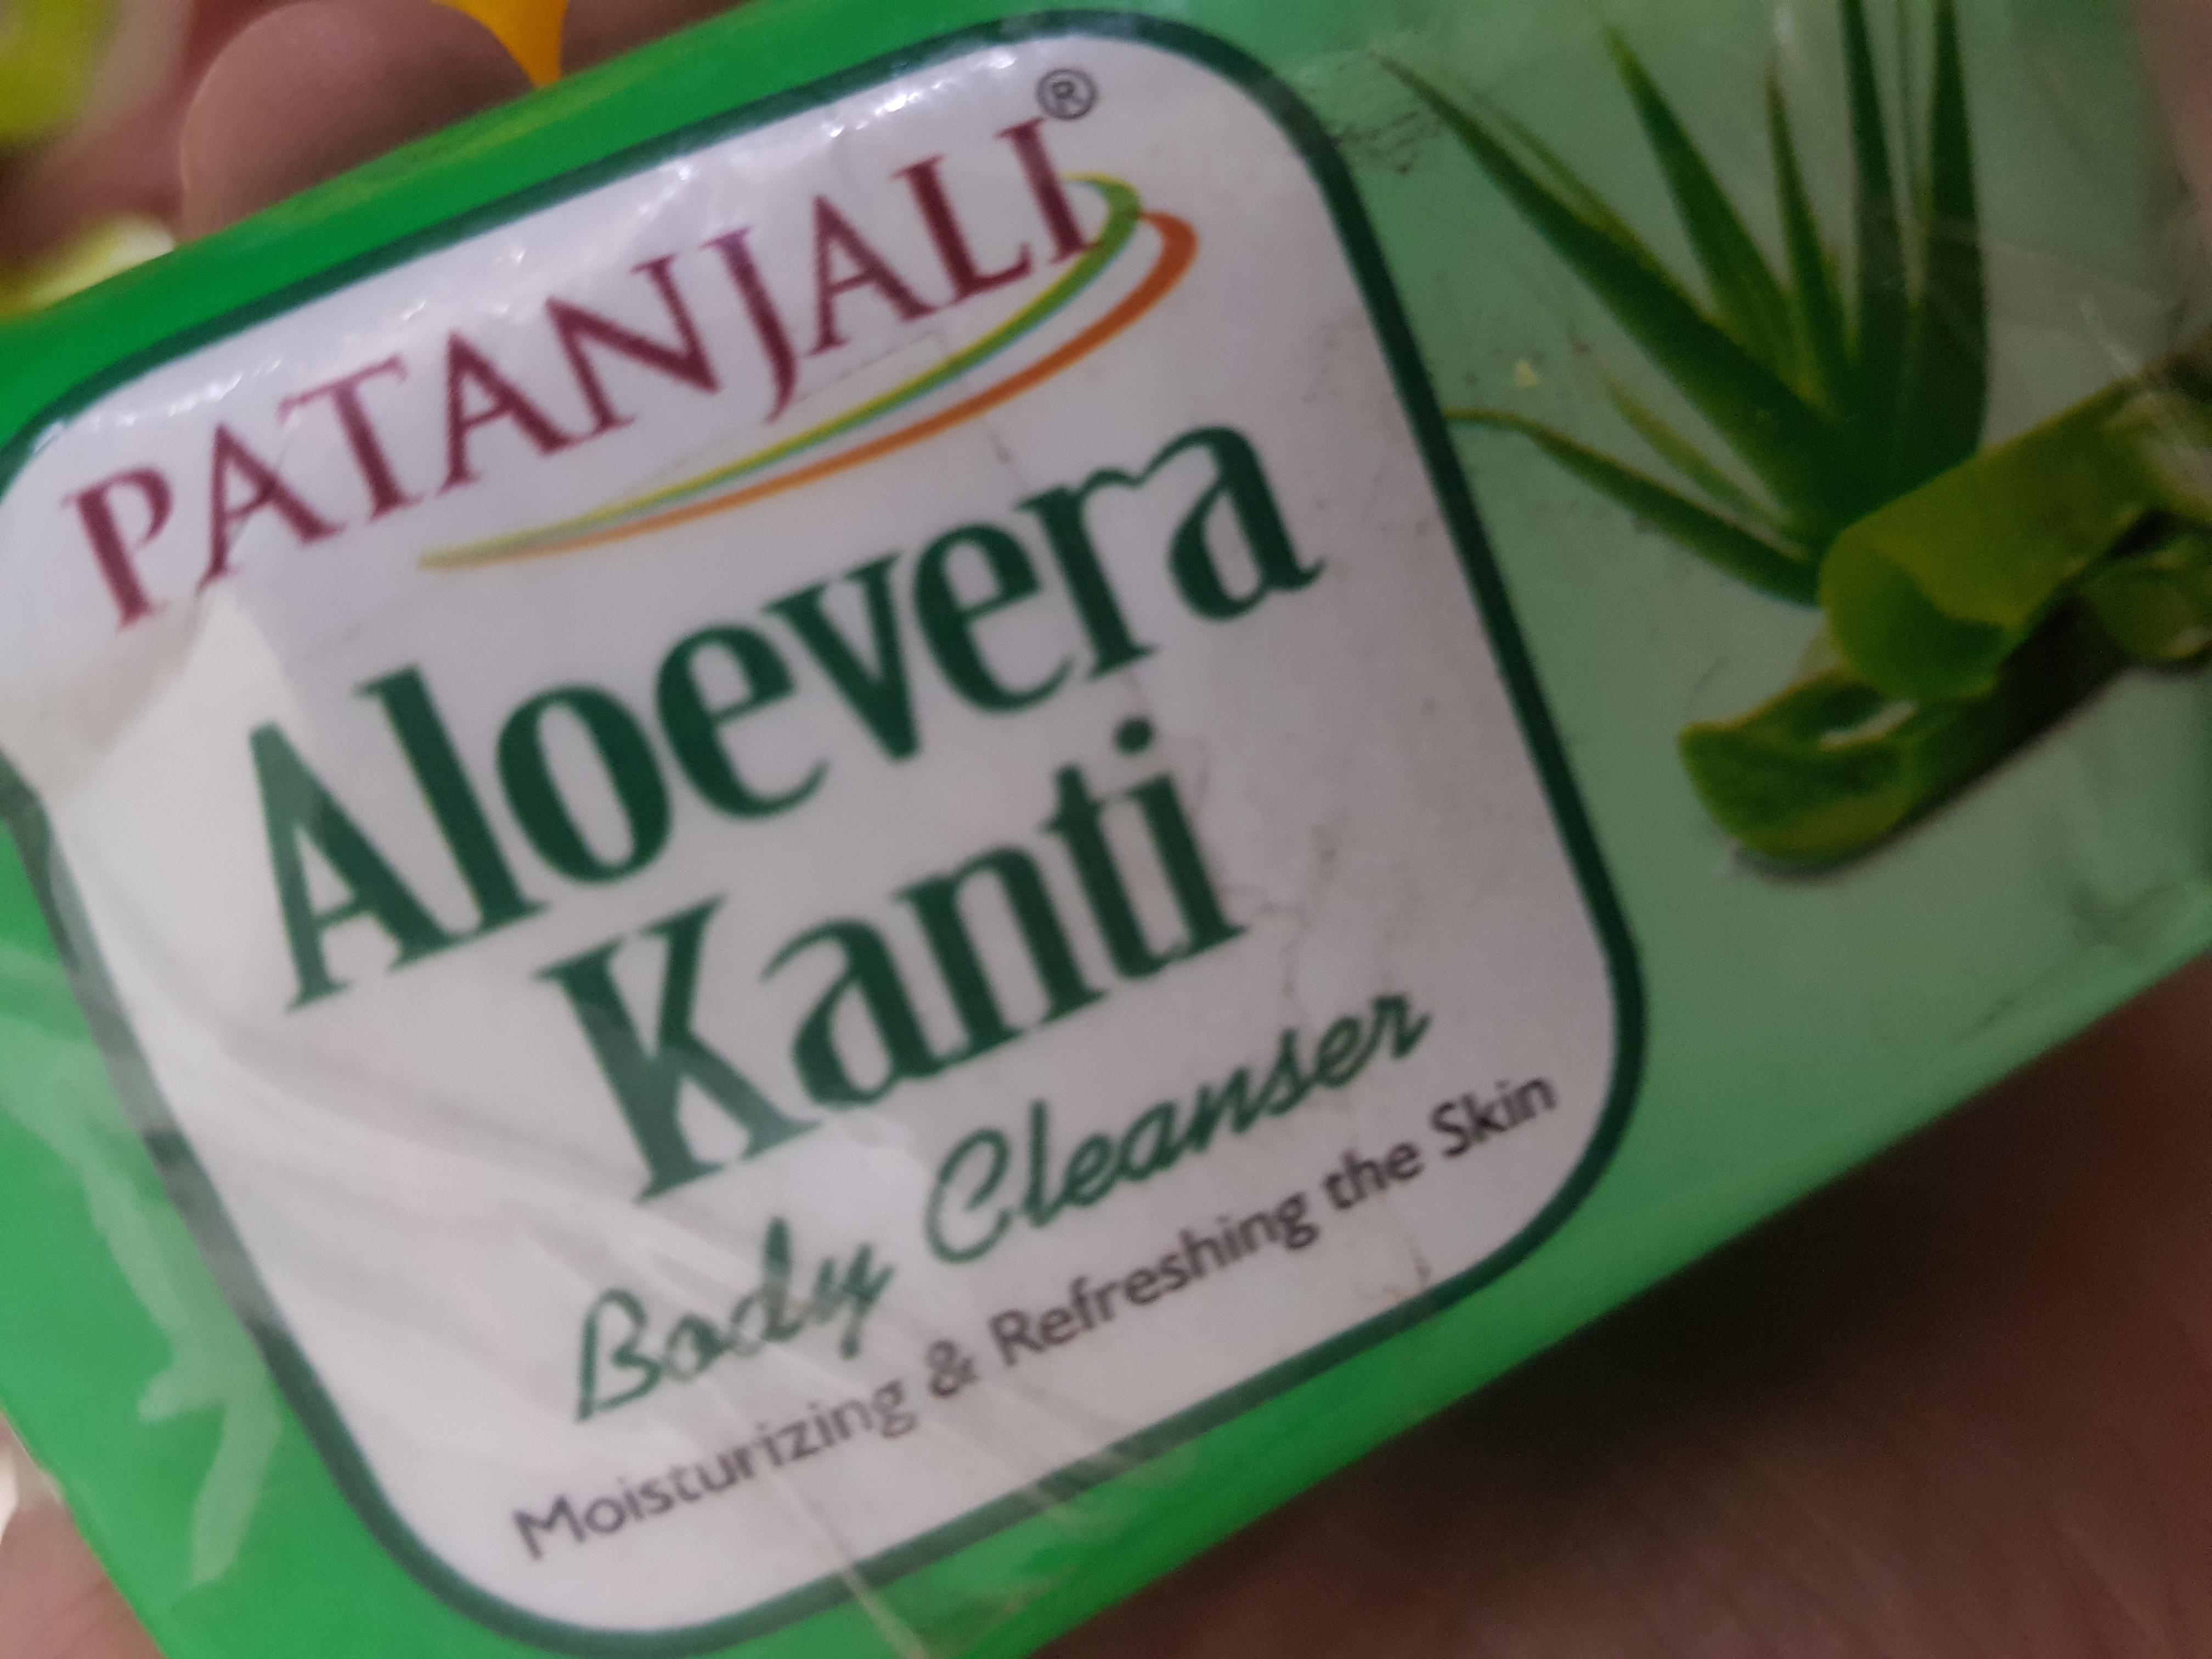 Patanjali Aloevera Kanti Body Cleanser-Aloe Vera!-By poonam_kakkar-1